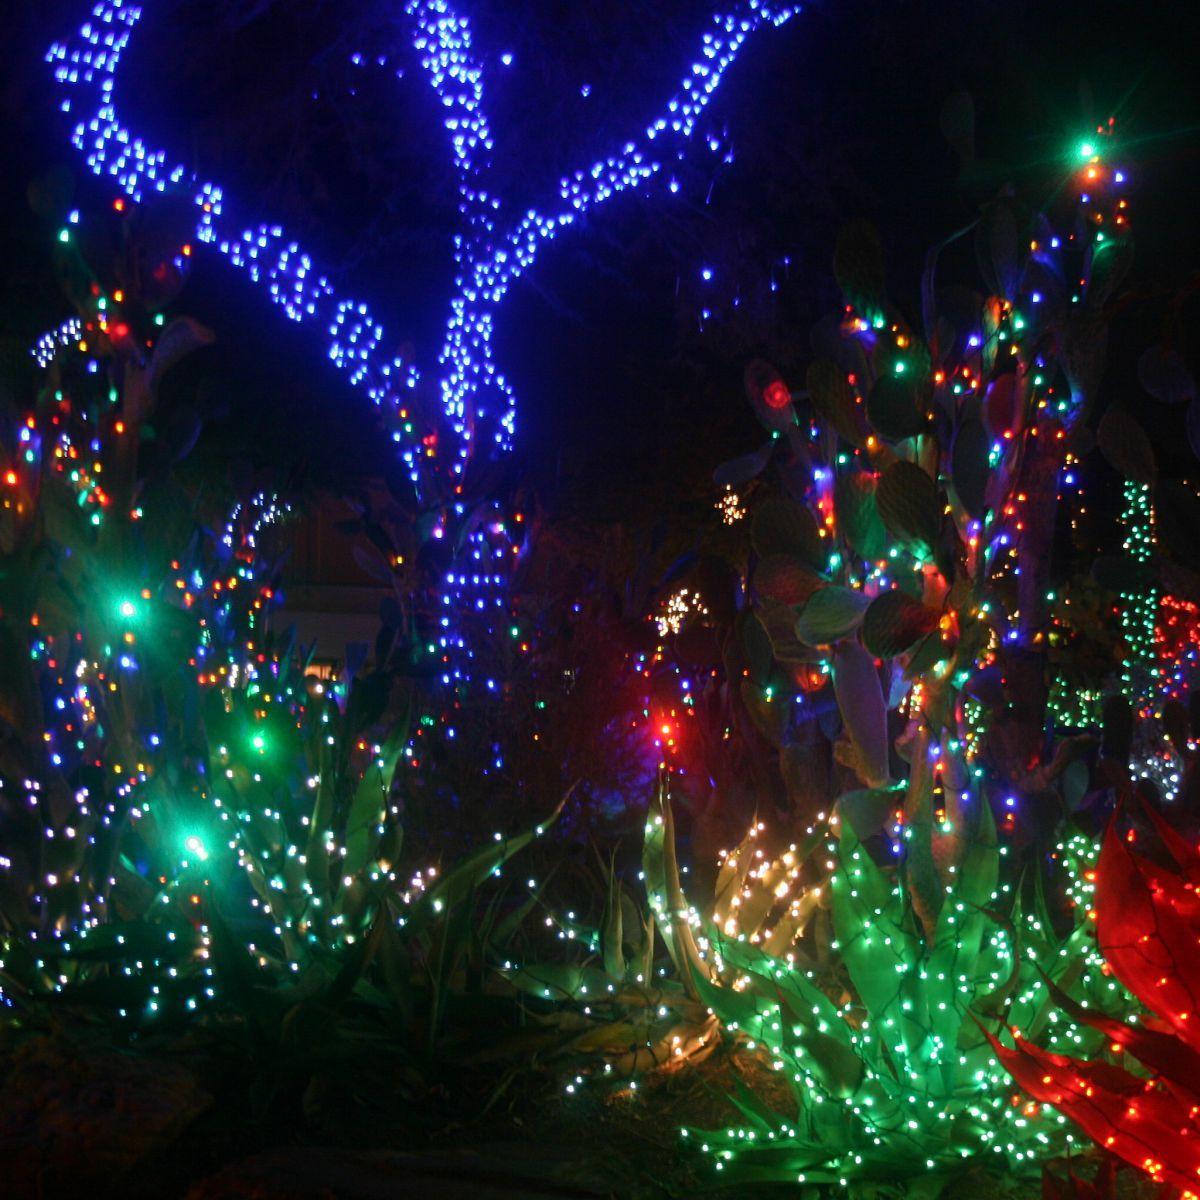 Ethel M Christmas Lights 2021 Christmas Lights 2 Trendi Stuff Christmas Pictures With Lights Cute Christmas Wallpaper Christmas Lights Wallpaper